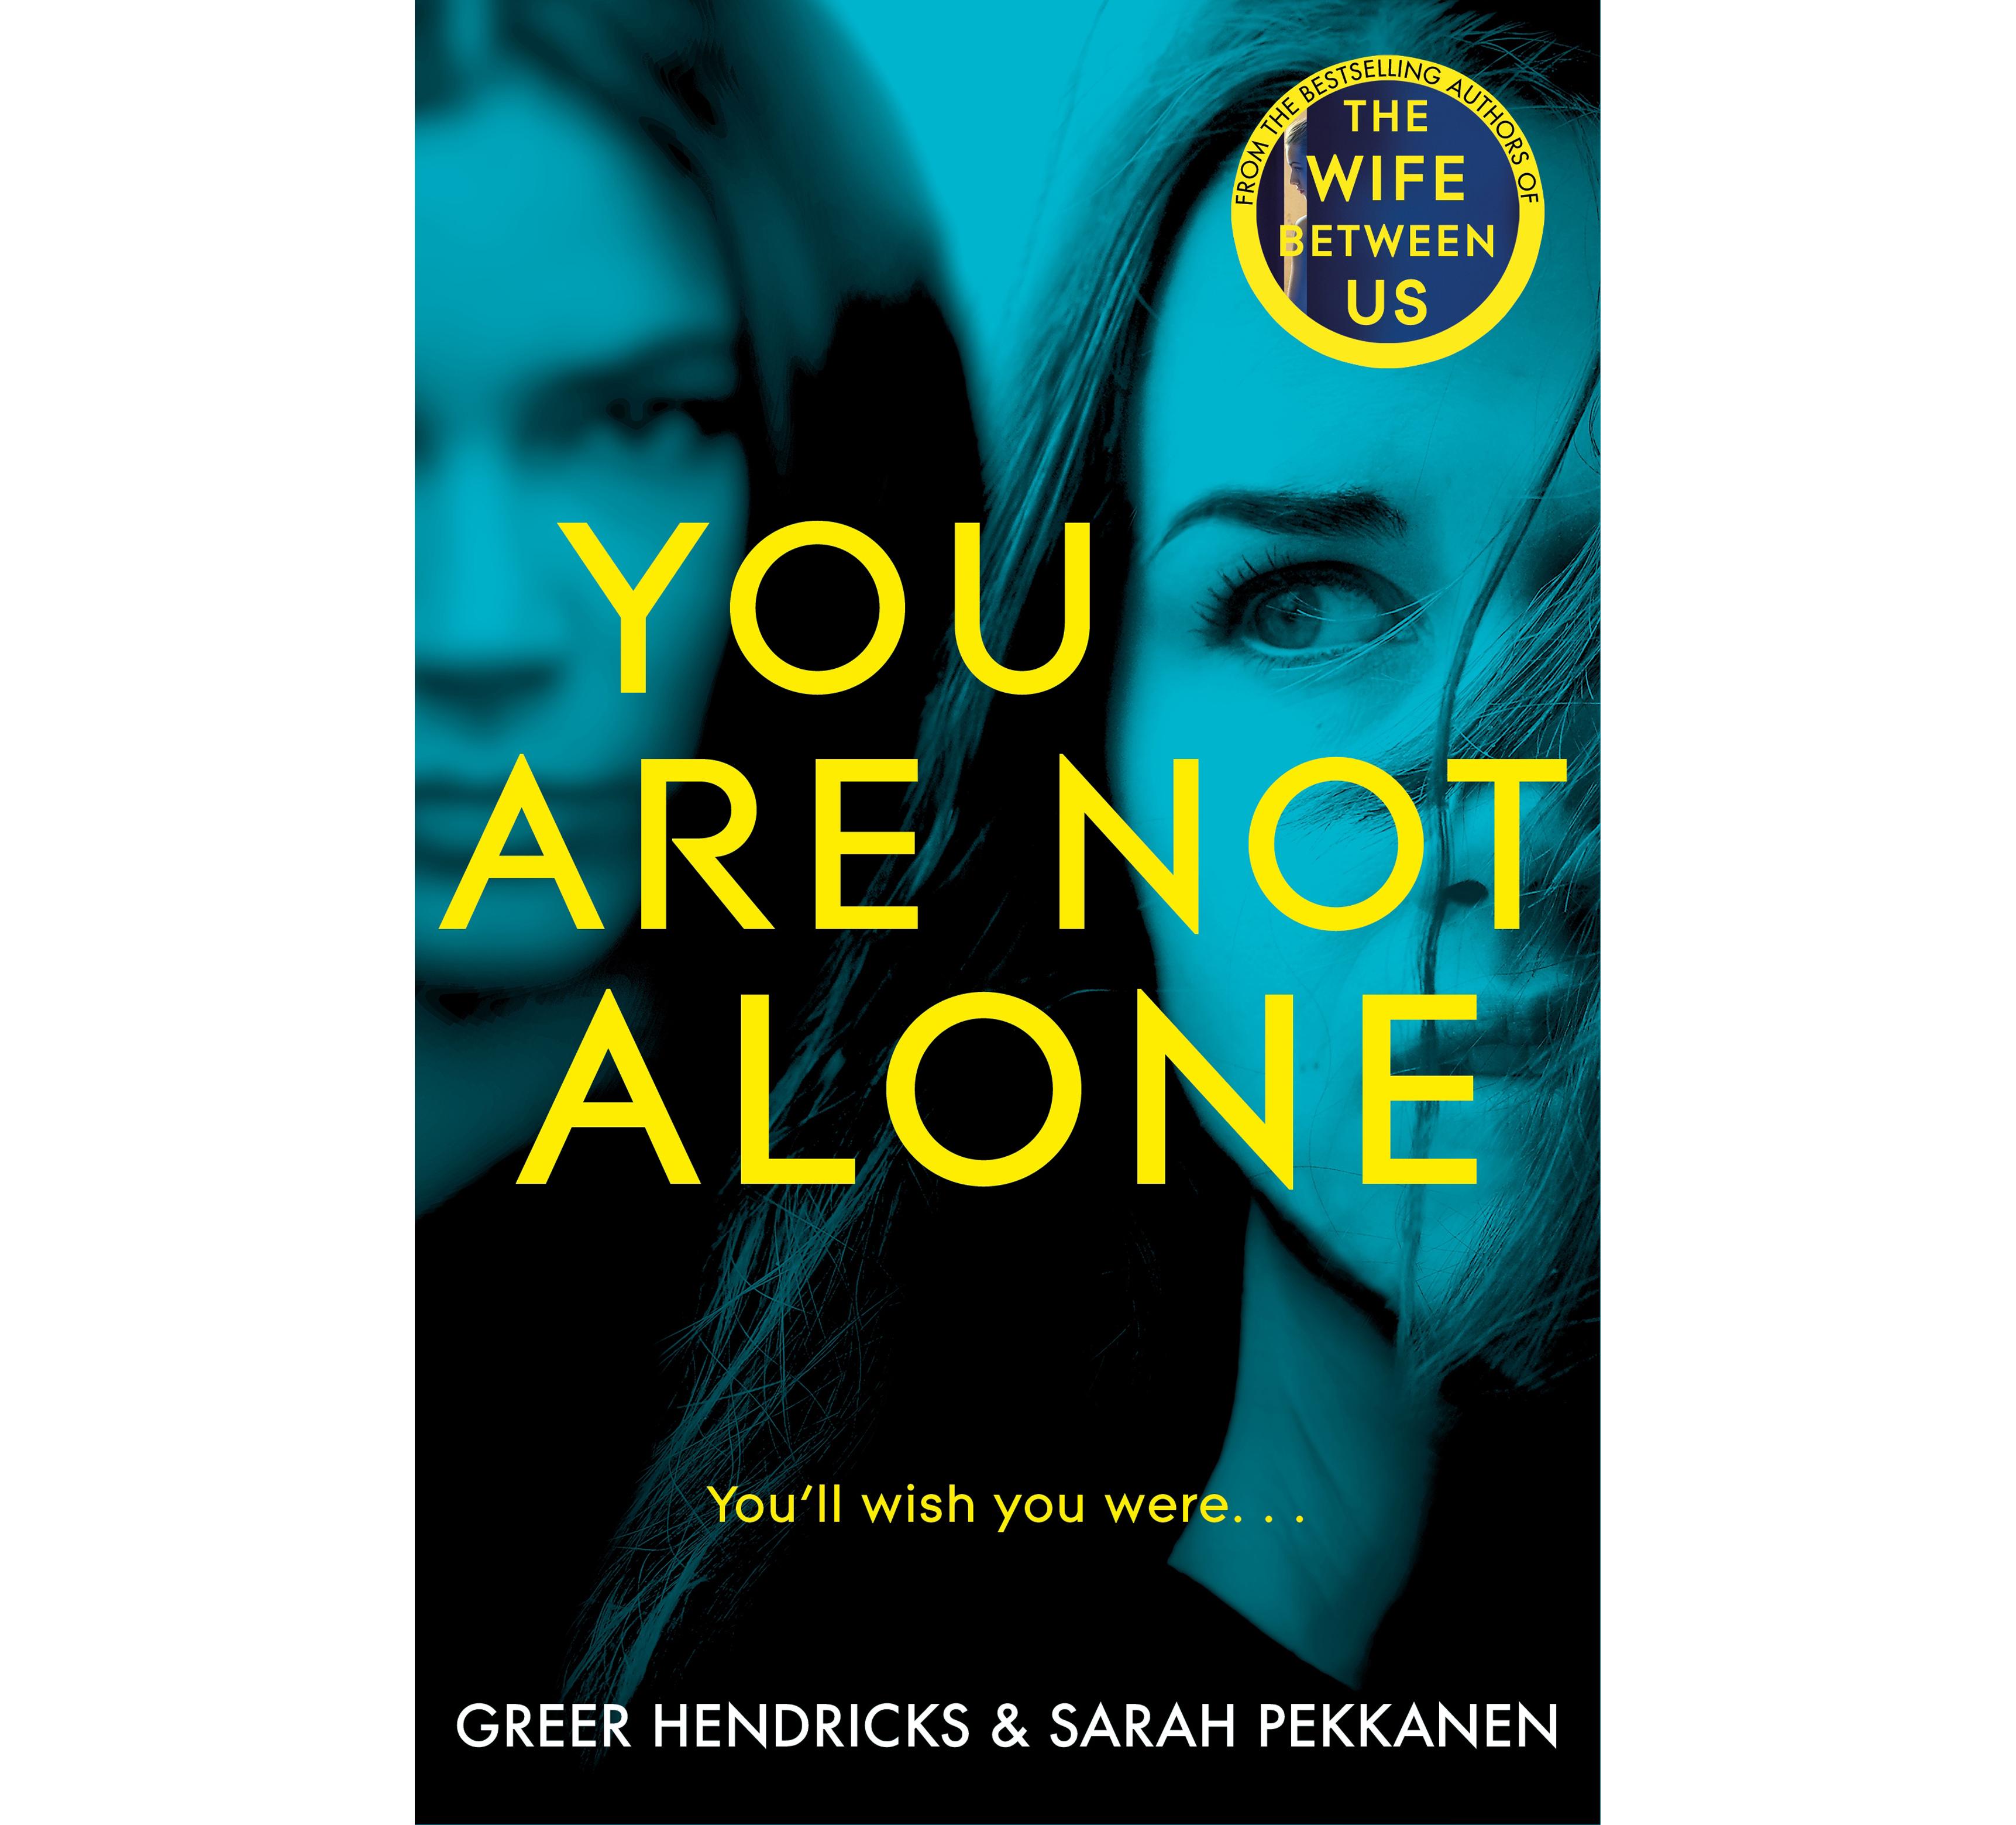 You Are Not Alone by Greer Hendricks and Sarah Pekkanen (Macmillan/PA)